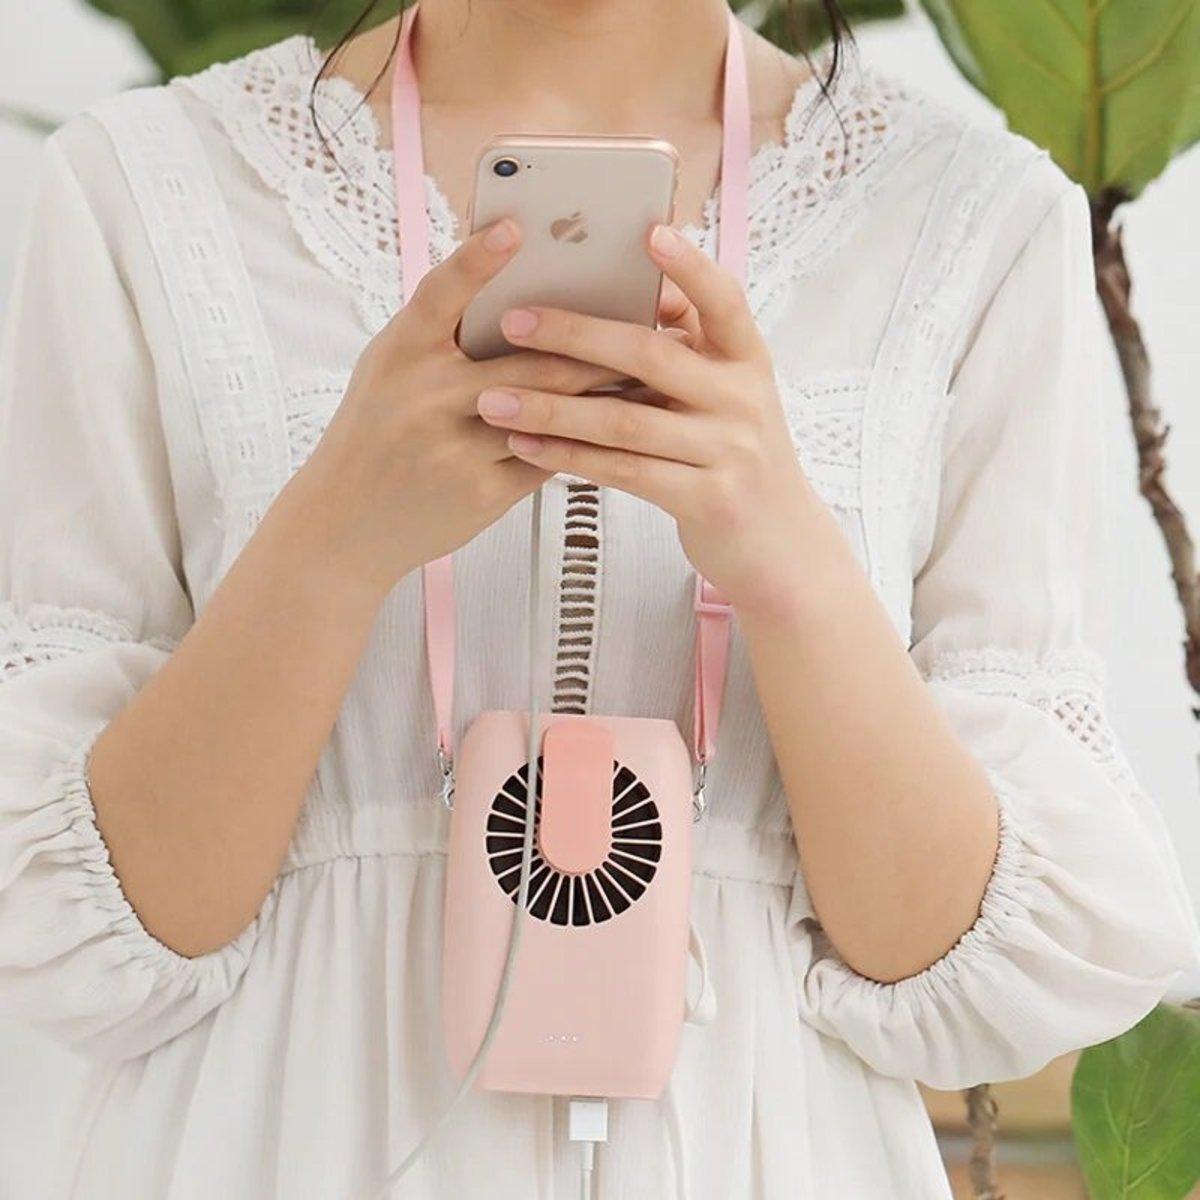 Mini Portable Outdoor Wristband Fan Electric Handheld